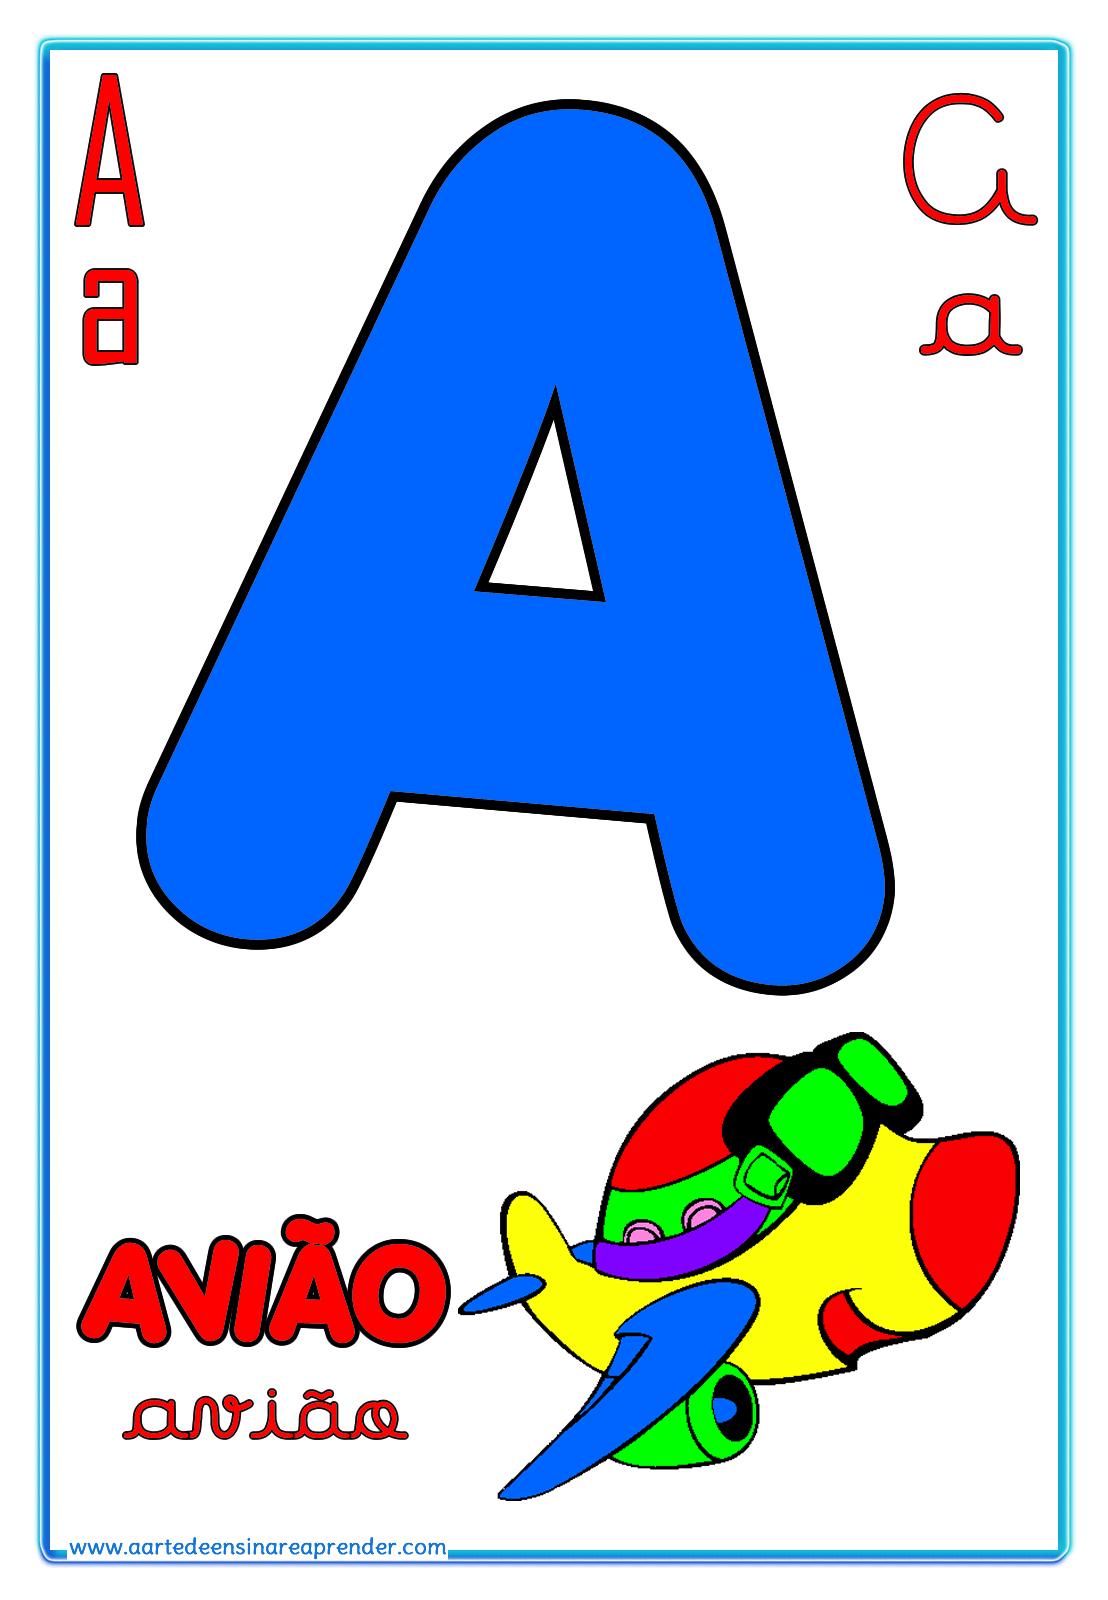 Alfabeto Quatro Tipos De Letras Reformulado A Arte De